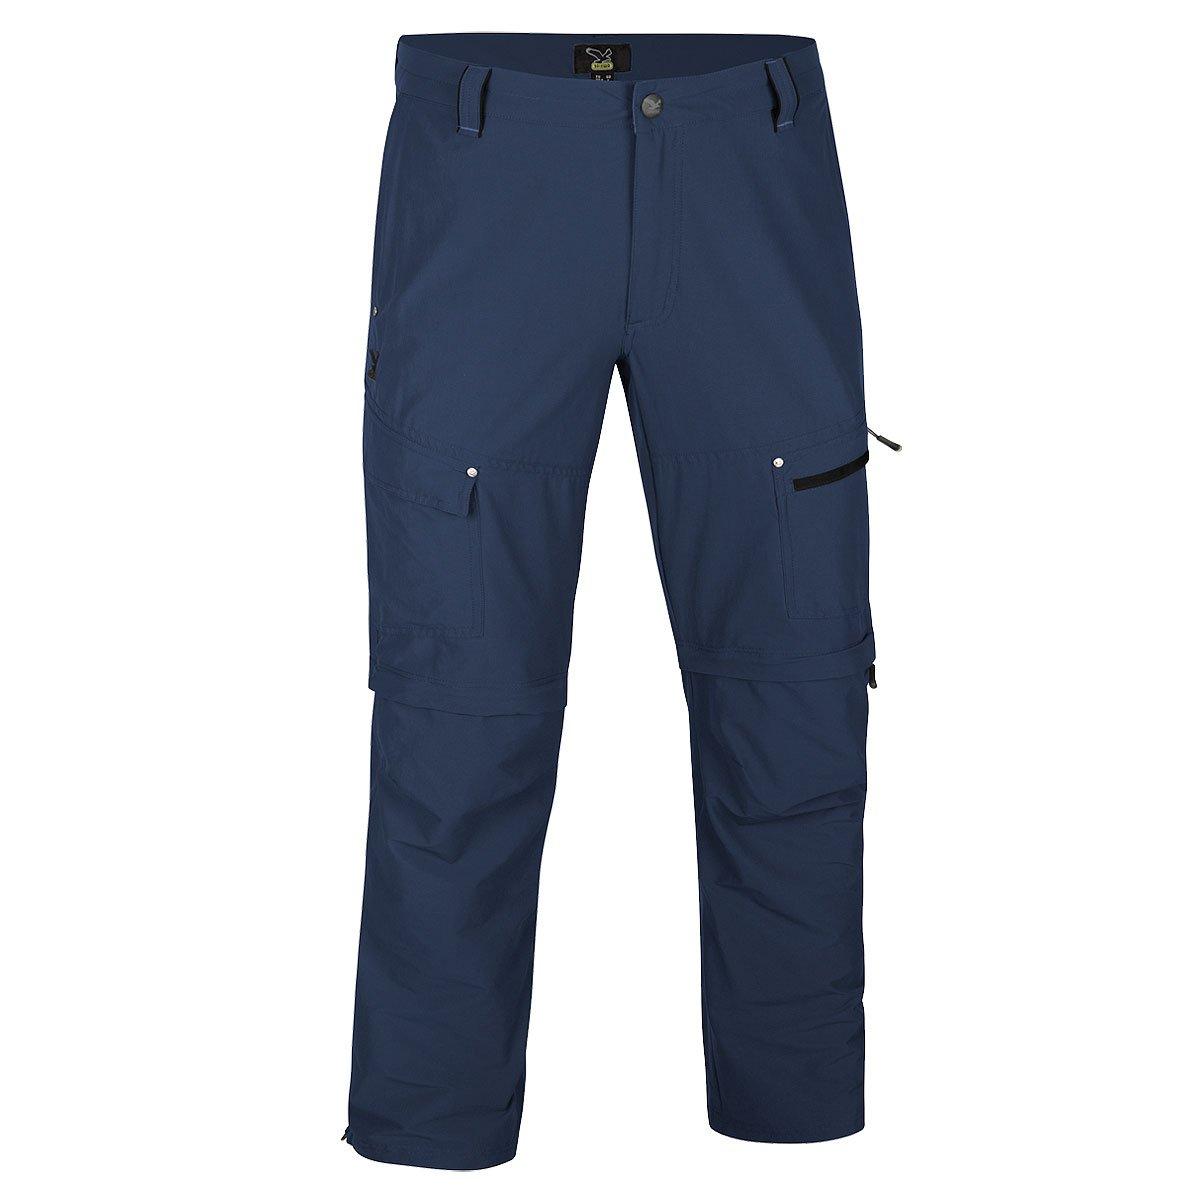 SALEWA Herren Hose Talut 2.0 Dry M 2/1 Reg Pants